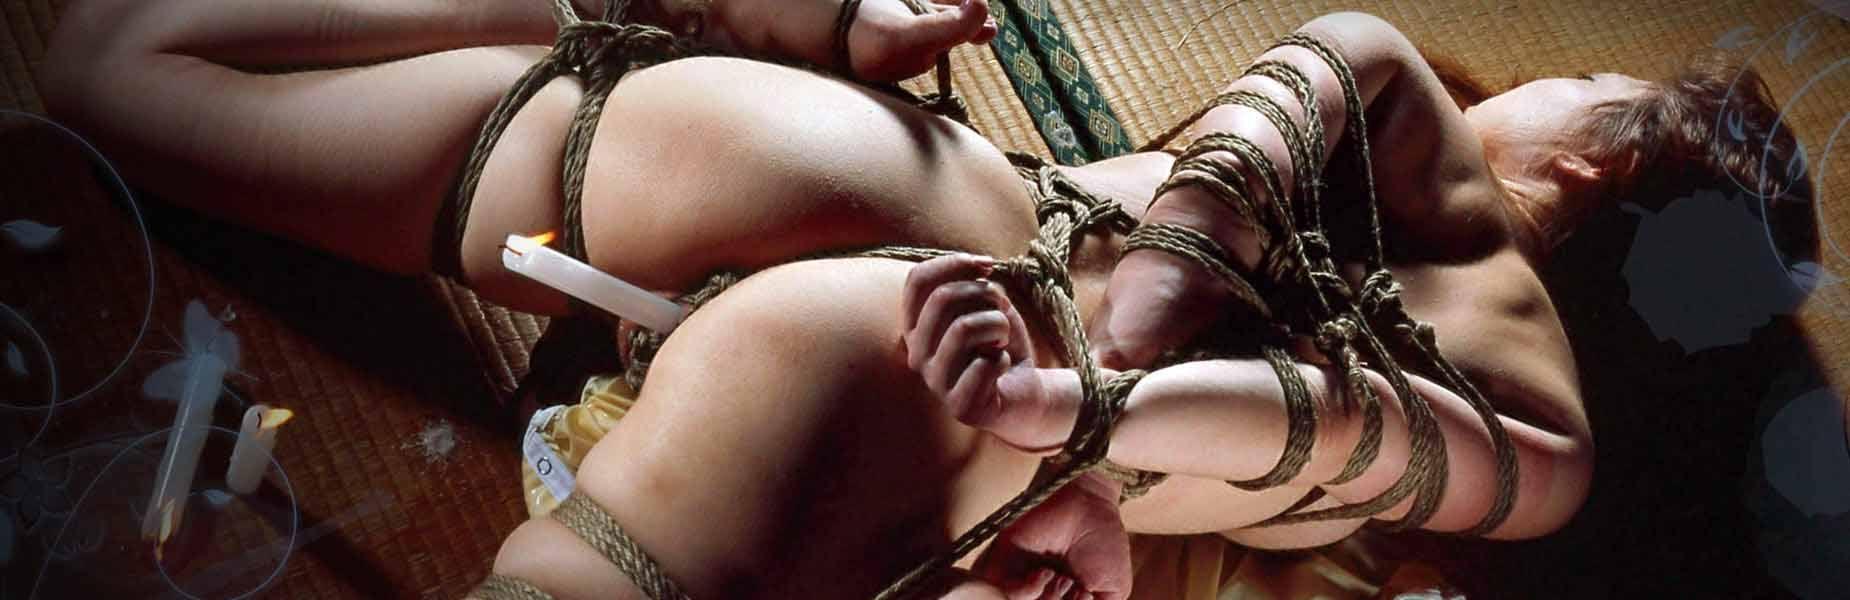 Baller reccomend Japanese rope bondage video